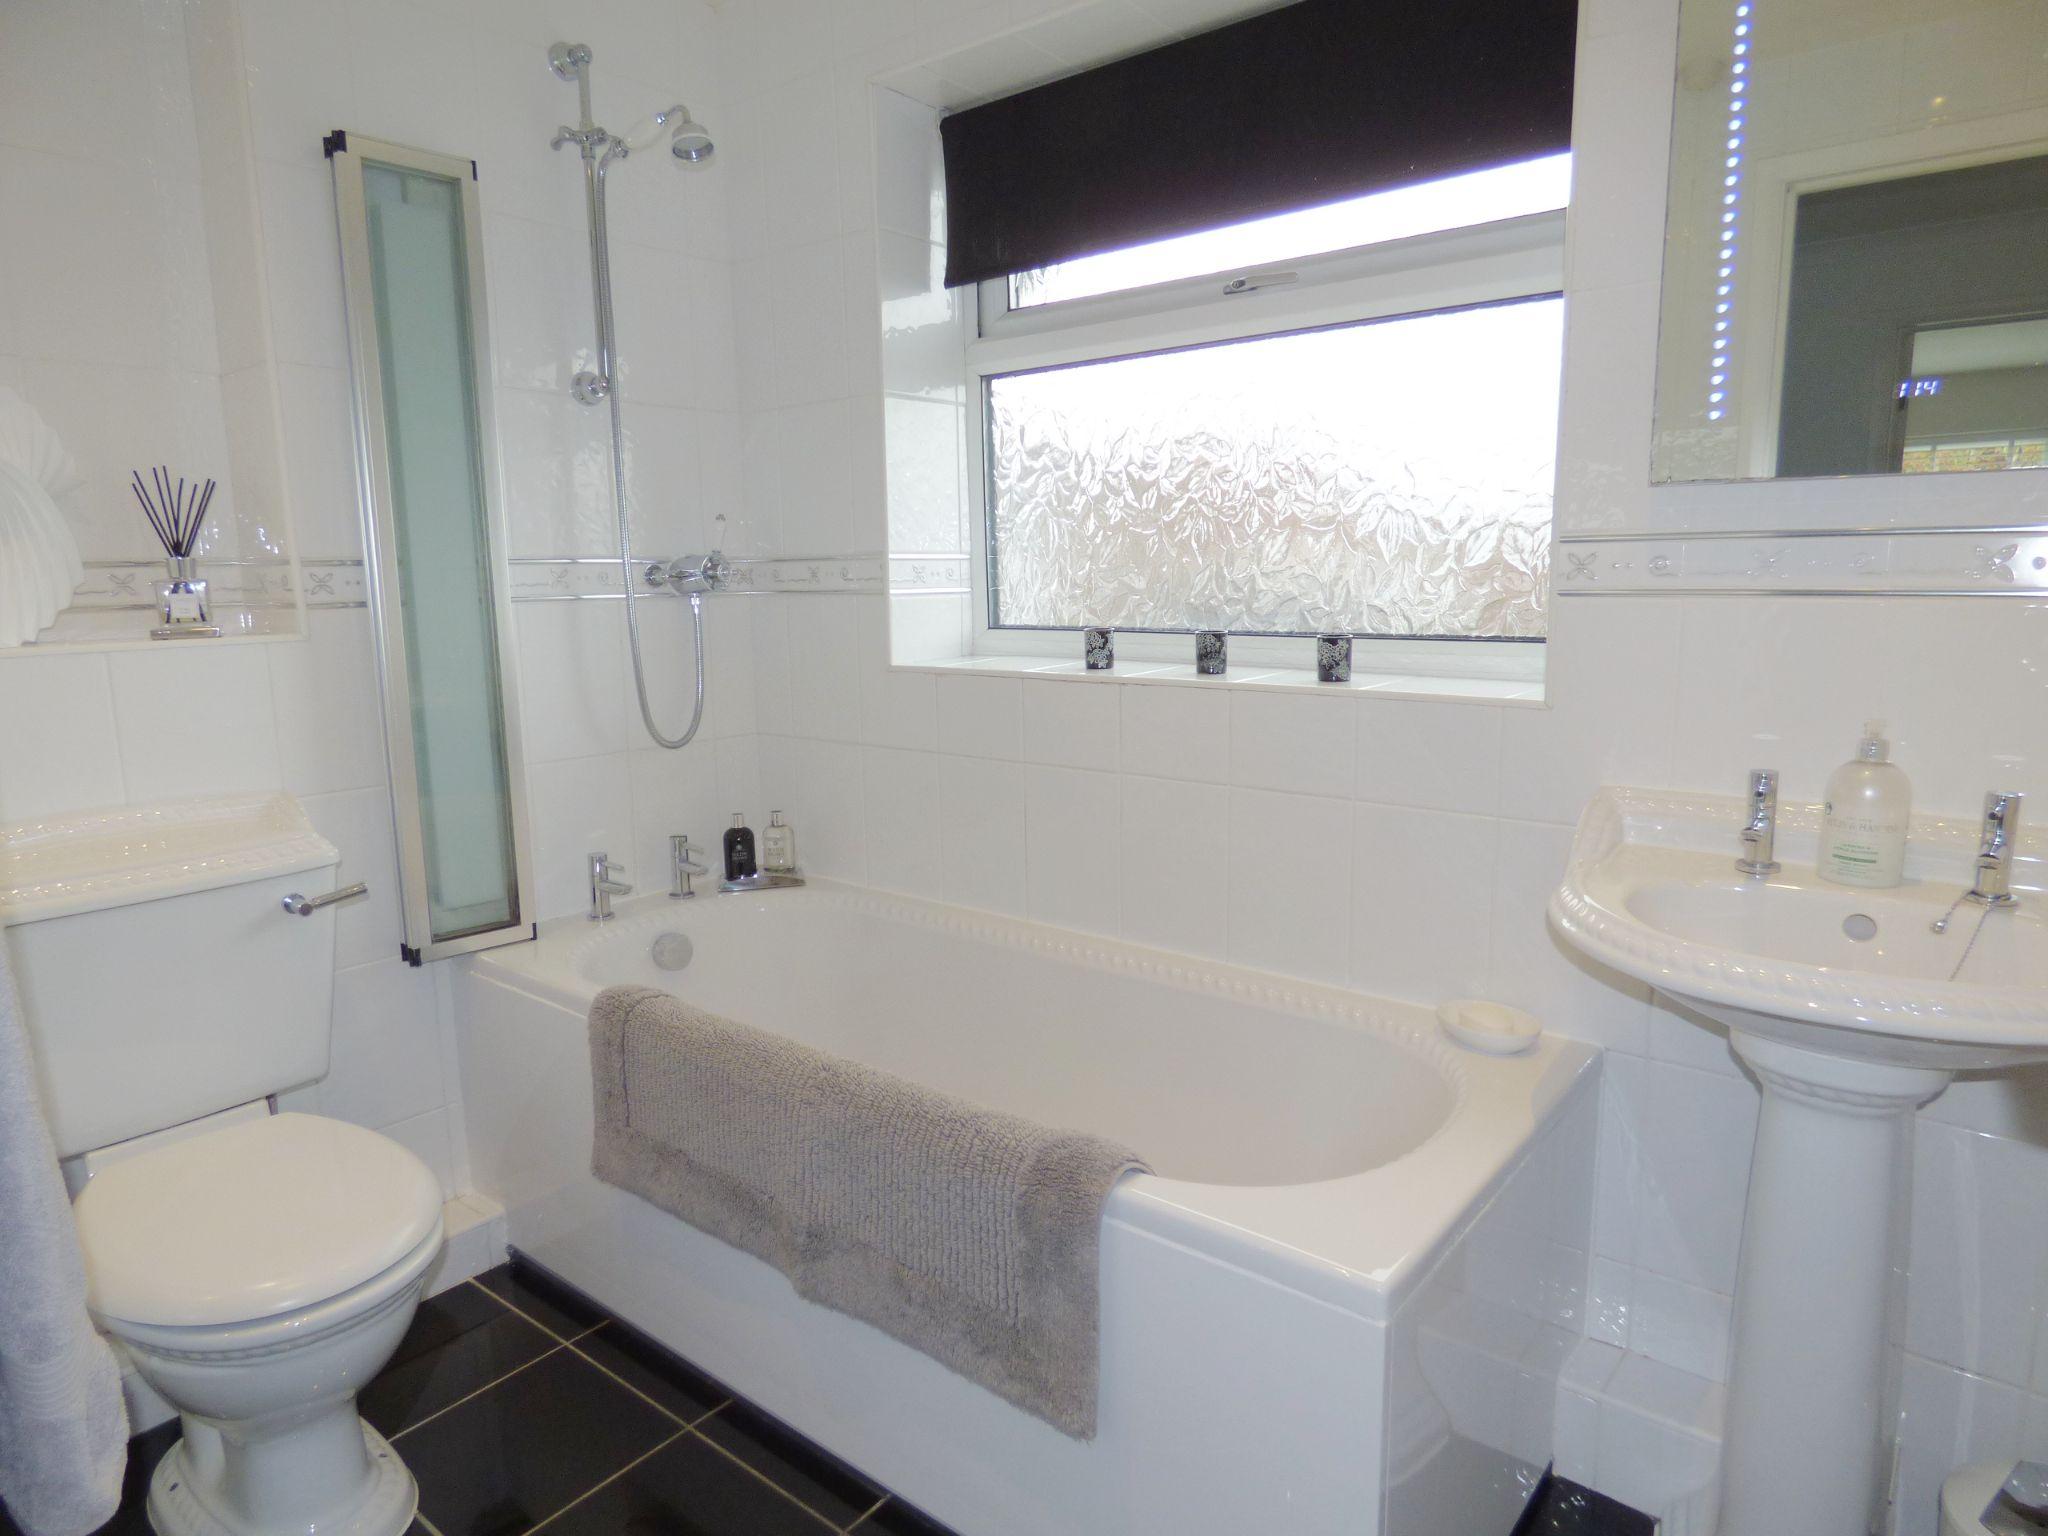 5 Bedroom Semi-detached House For Sale - Bathroom